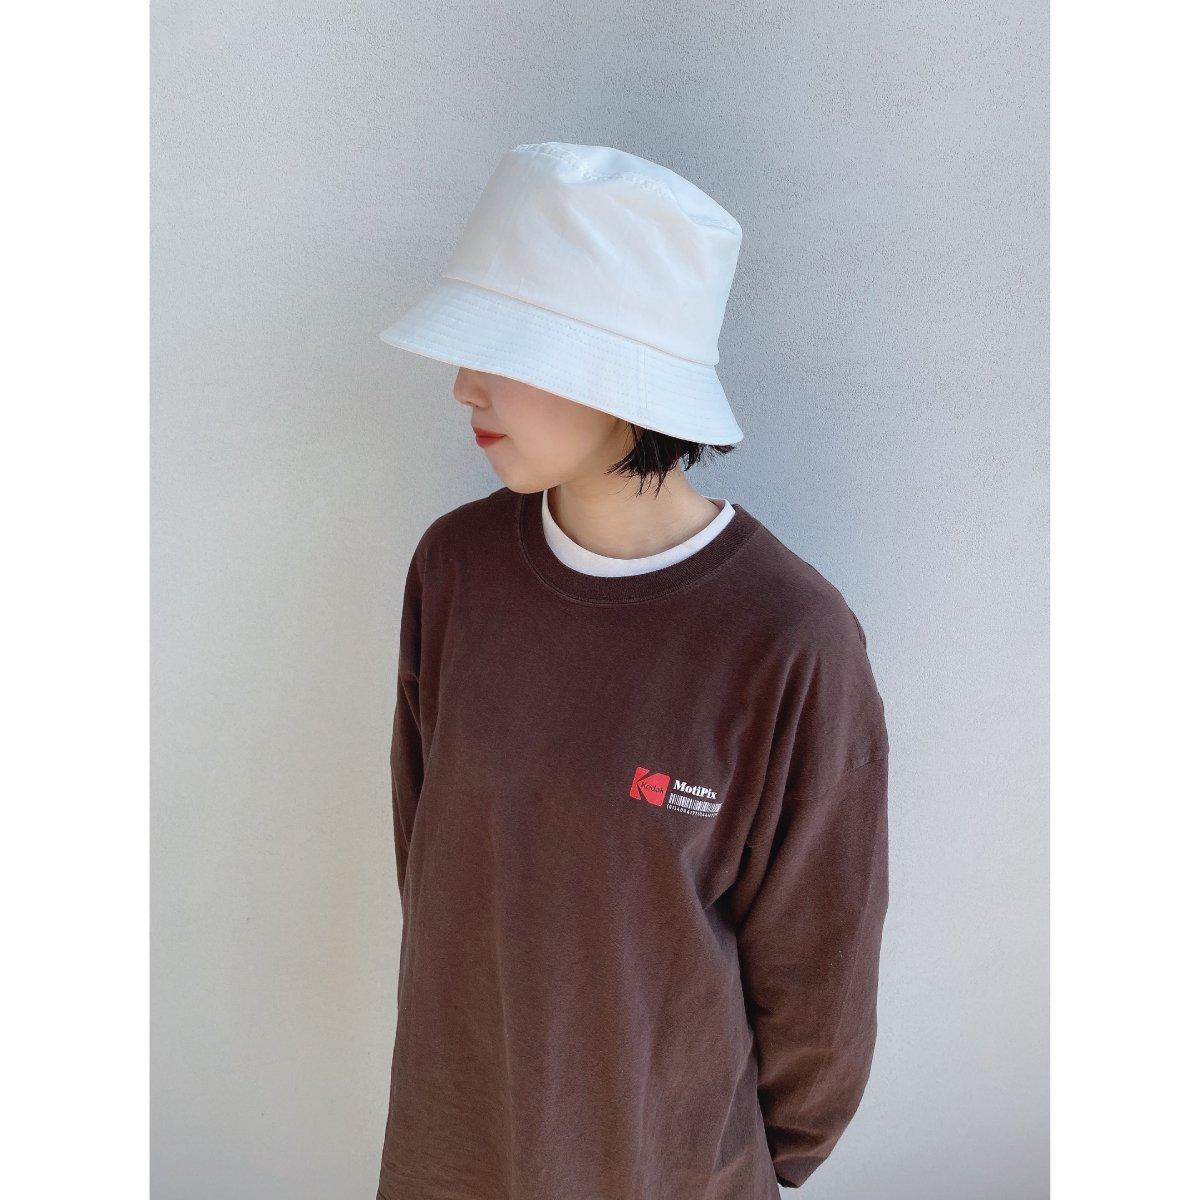 Genius BK Hat 詳細画像13